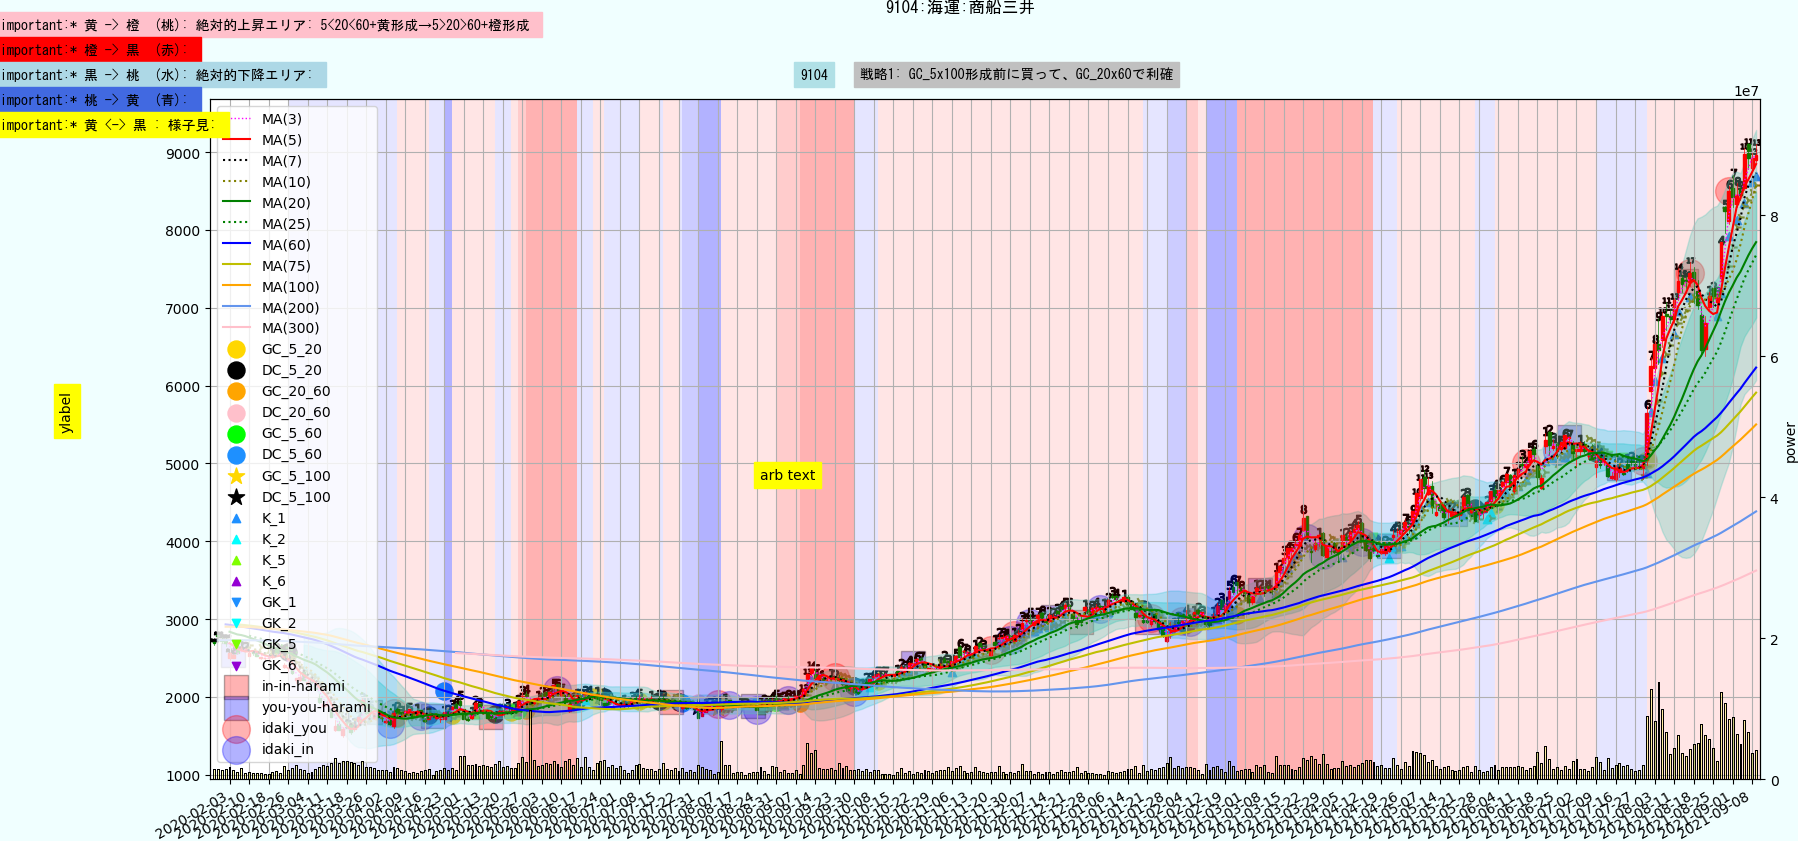 https://trident-capital-strage.s3.ap-northeast-1.amazonaws.com/charts/20210909/9104.png